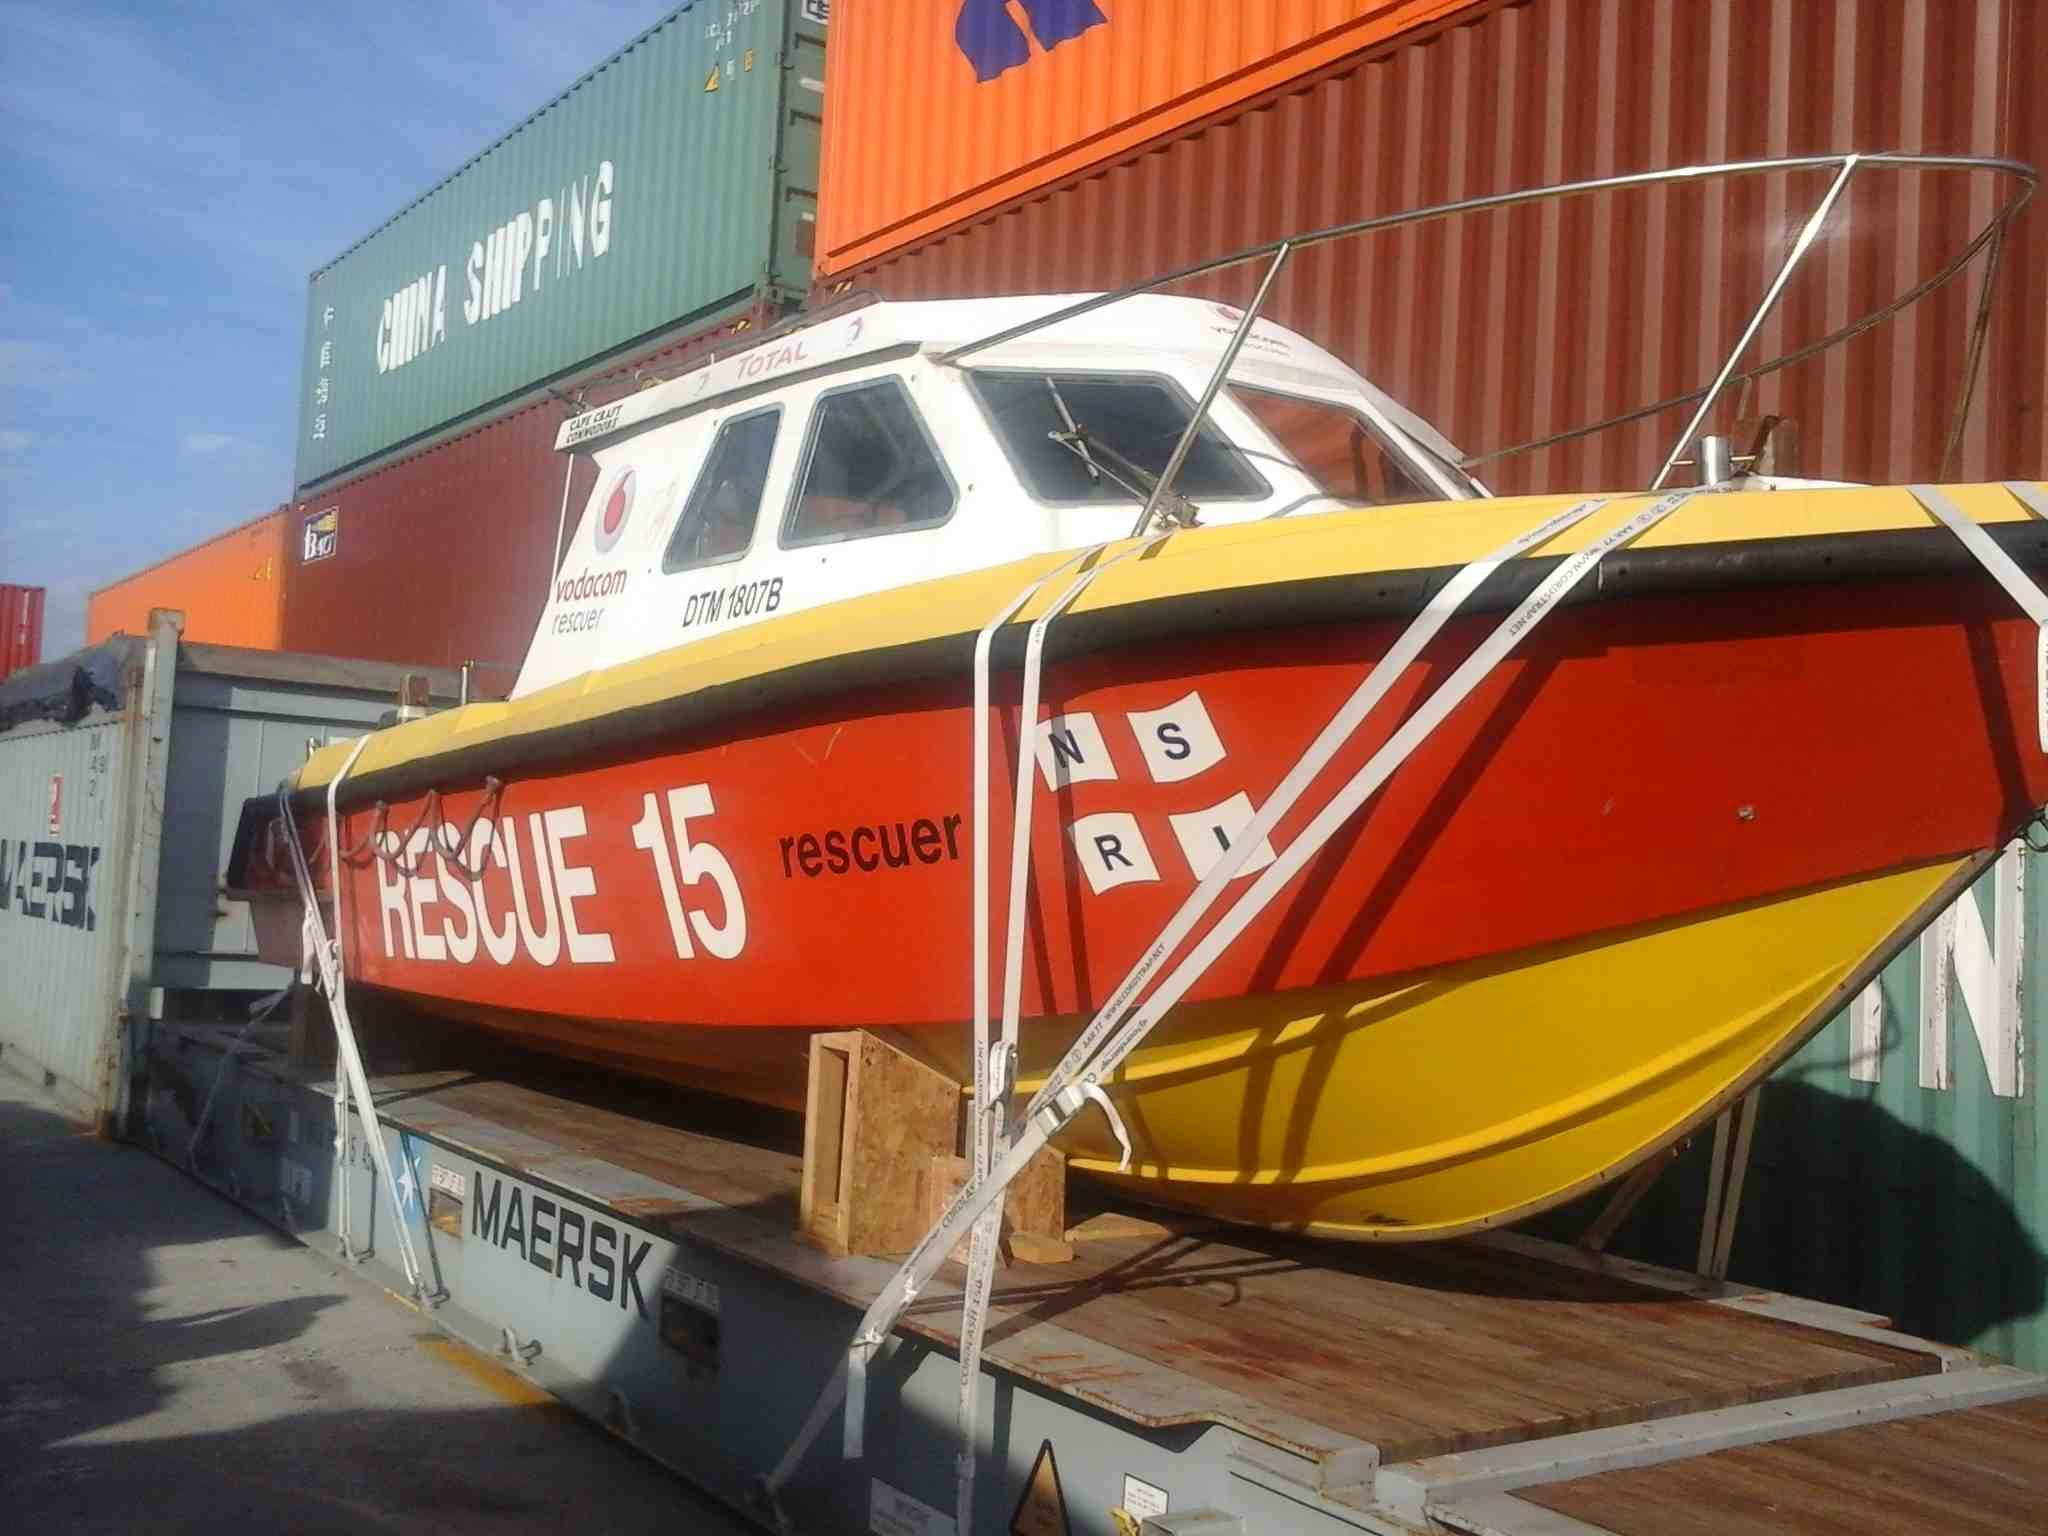 Vodacom rescuer en route to Uruguay.